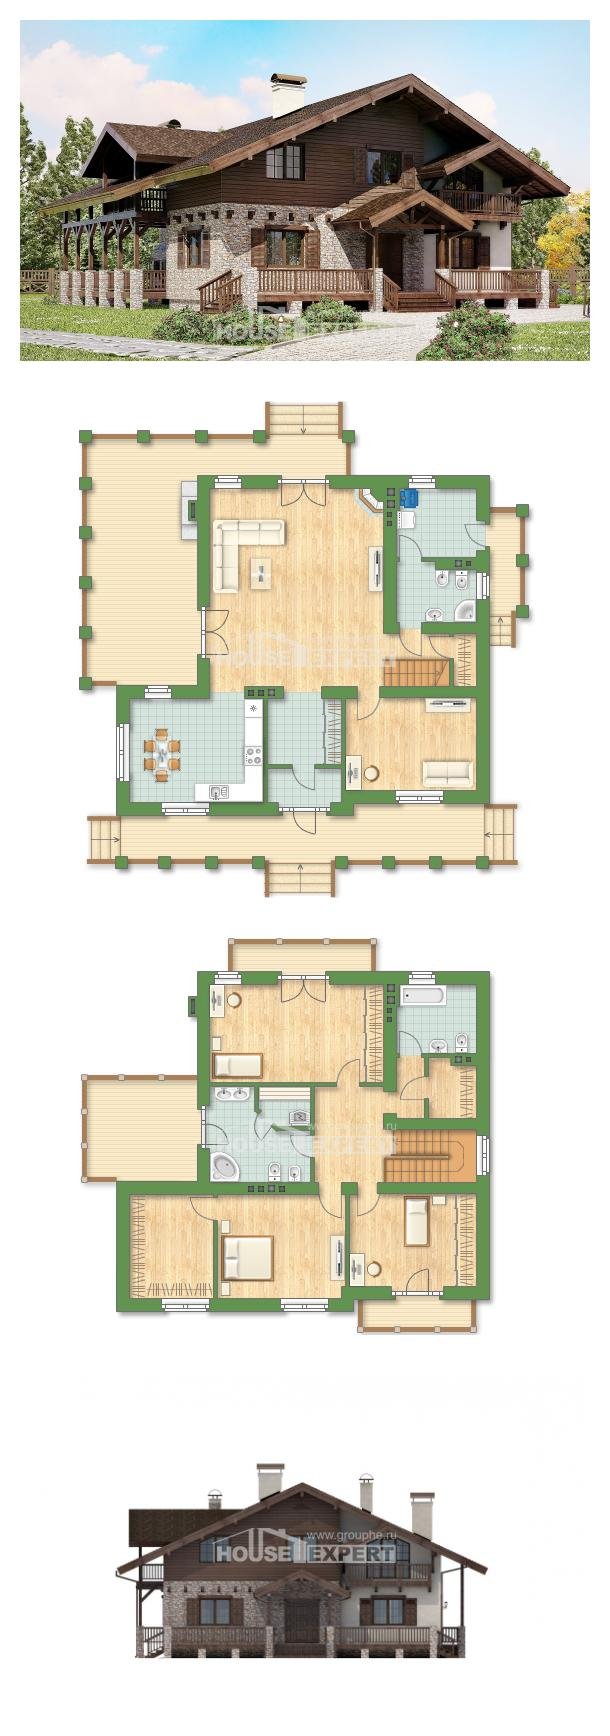 Projekt domu 250-003-R | House Expert